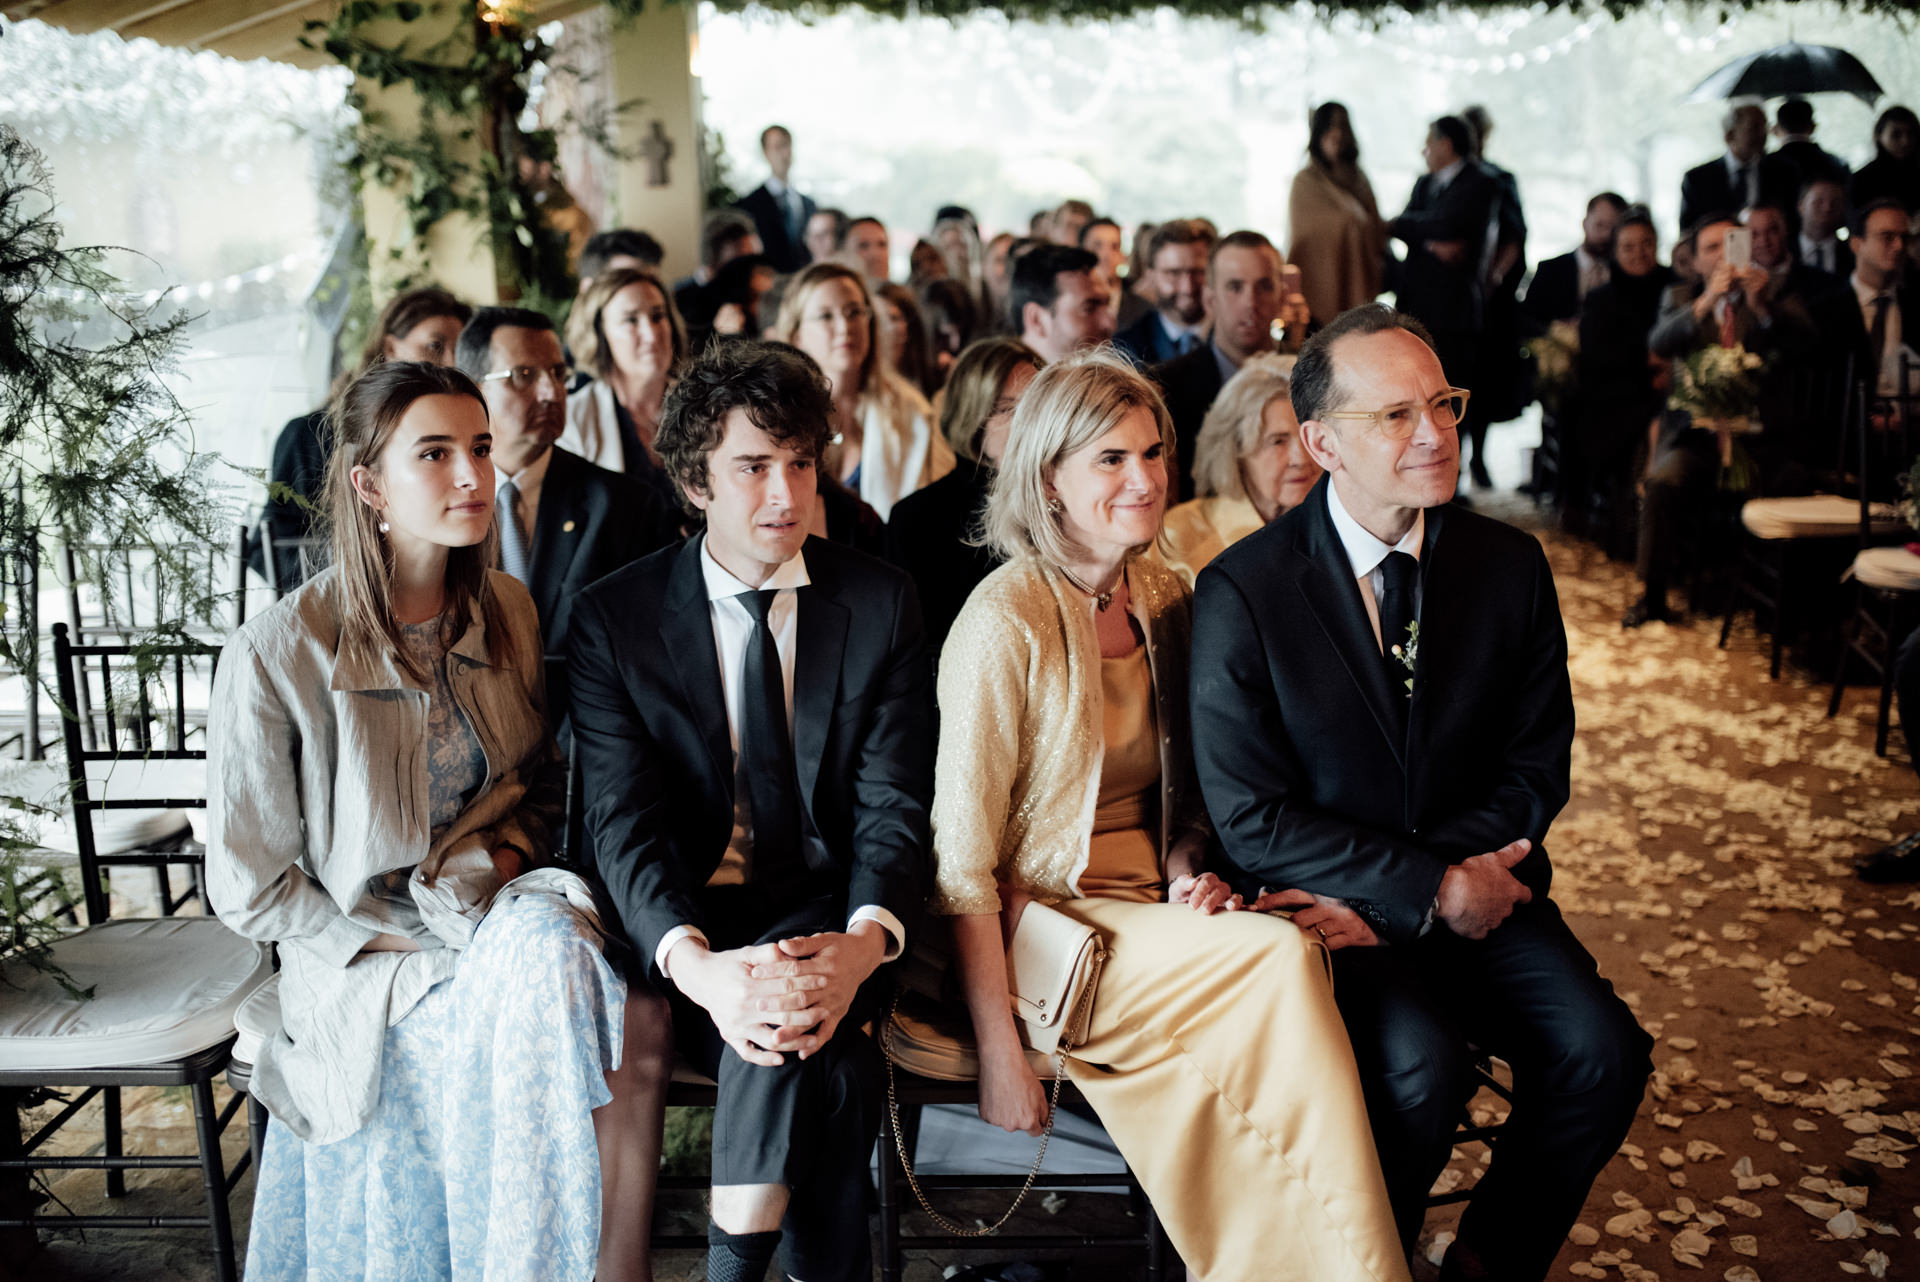 guests wedding ceremony